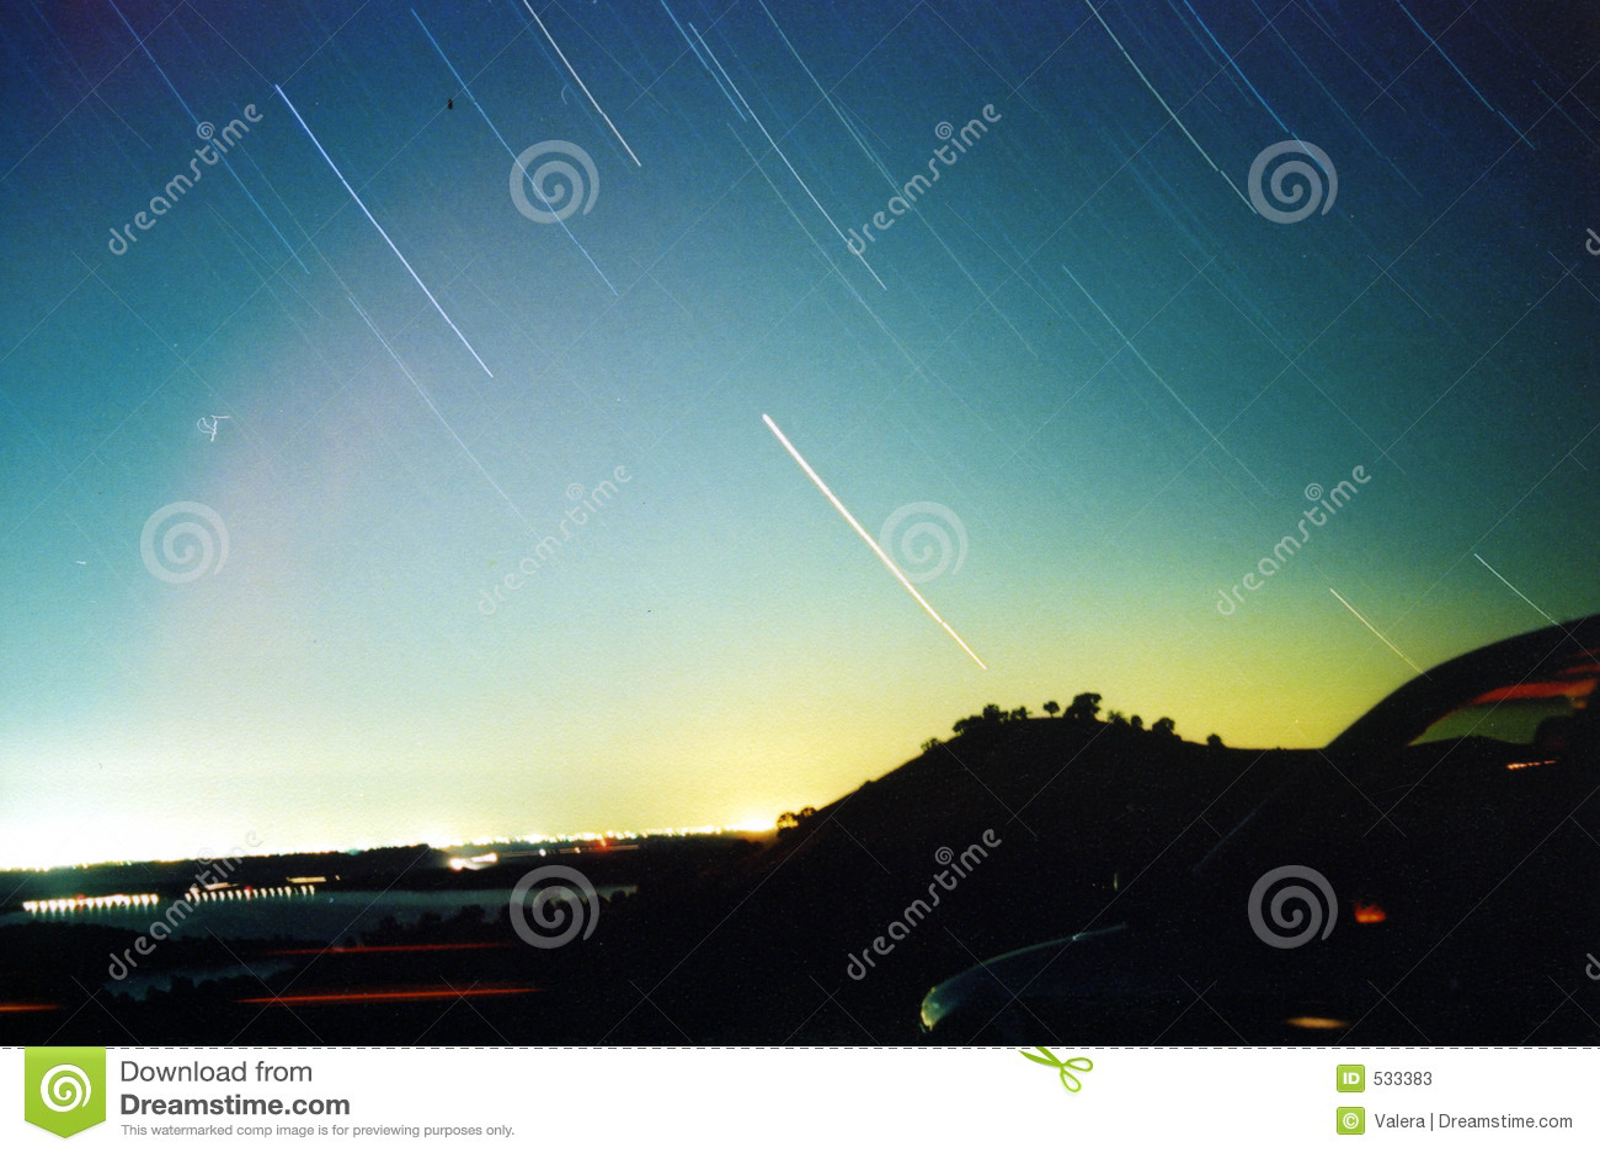 Download 夜空 库存图片. 图片 包括有 视图, 城市, 晒裂, 晚上, 眺望, 阵营, 星形, 仍然, 逃走, 飞星 - 533383